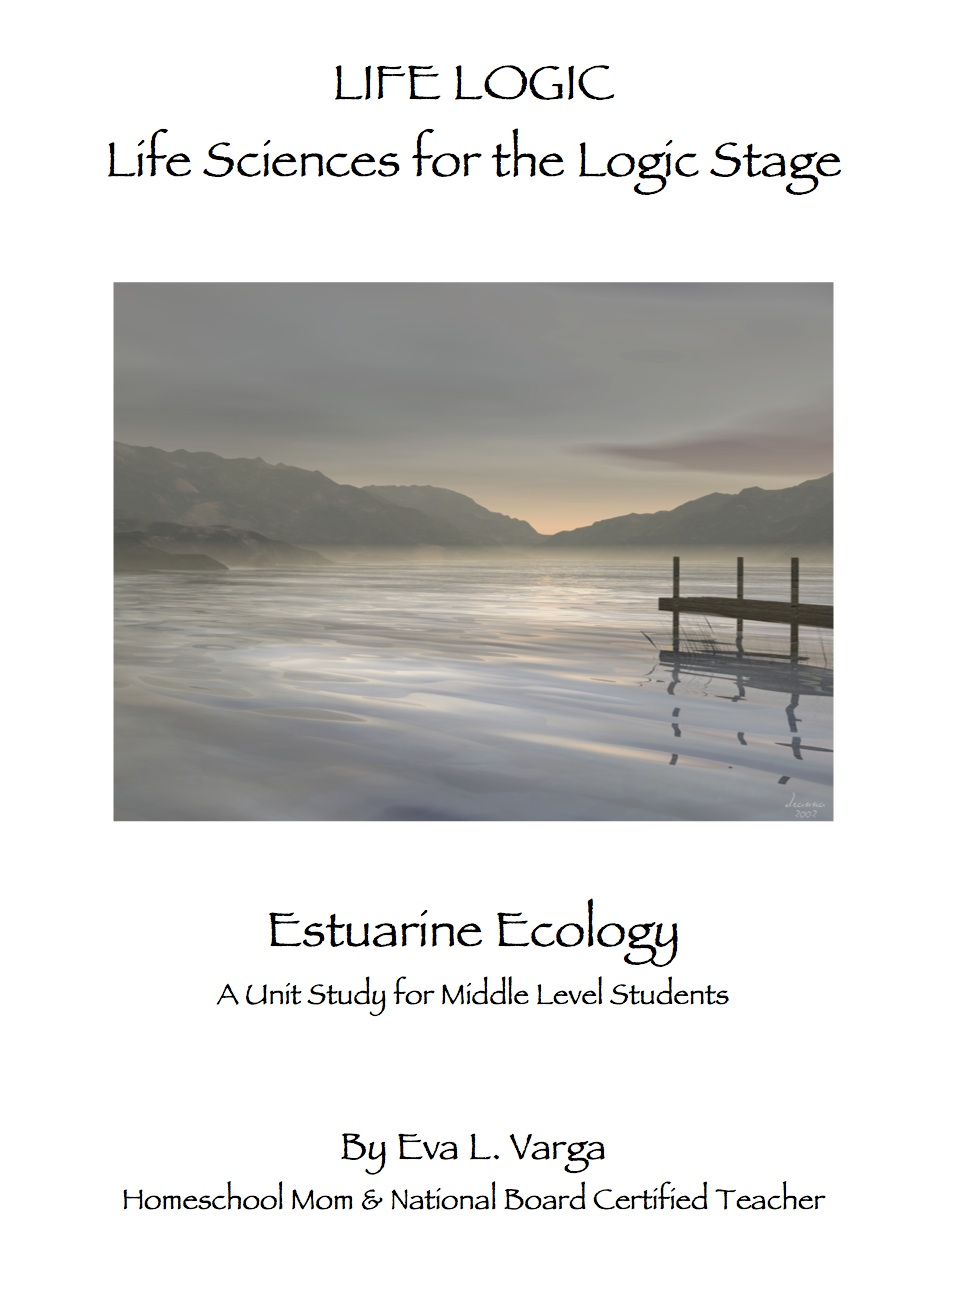 estuarine ecology Estuarine ecology, second edition - wiley online library biology of estuarine management - kkntsautorentalscom sat, 23 jun 2018 09:31:00 gmt.